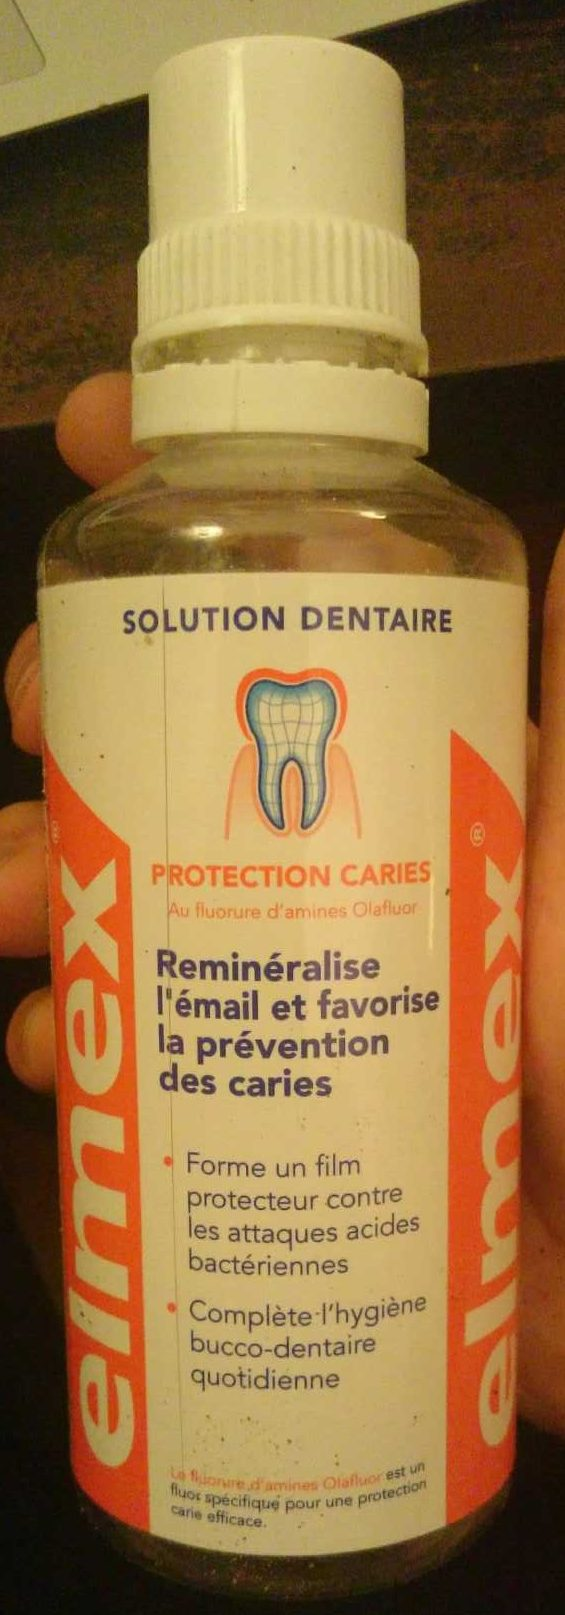 Protection carries - Produit